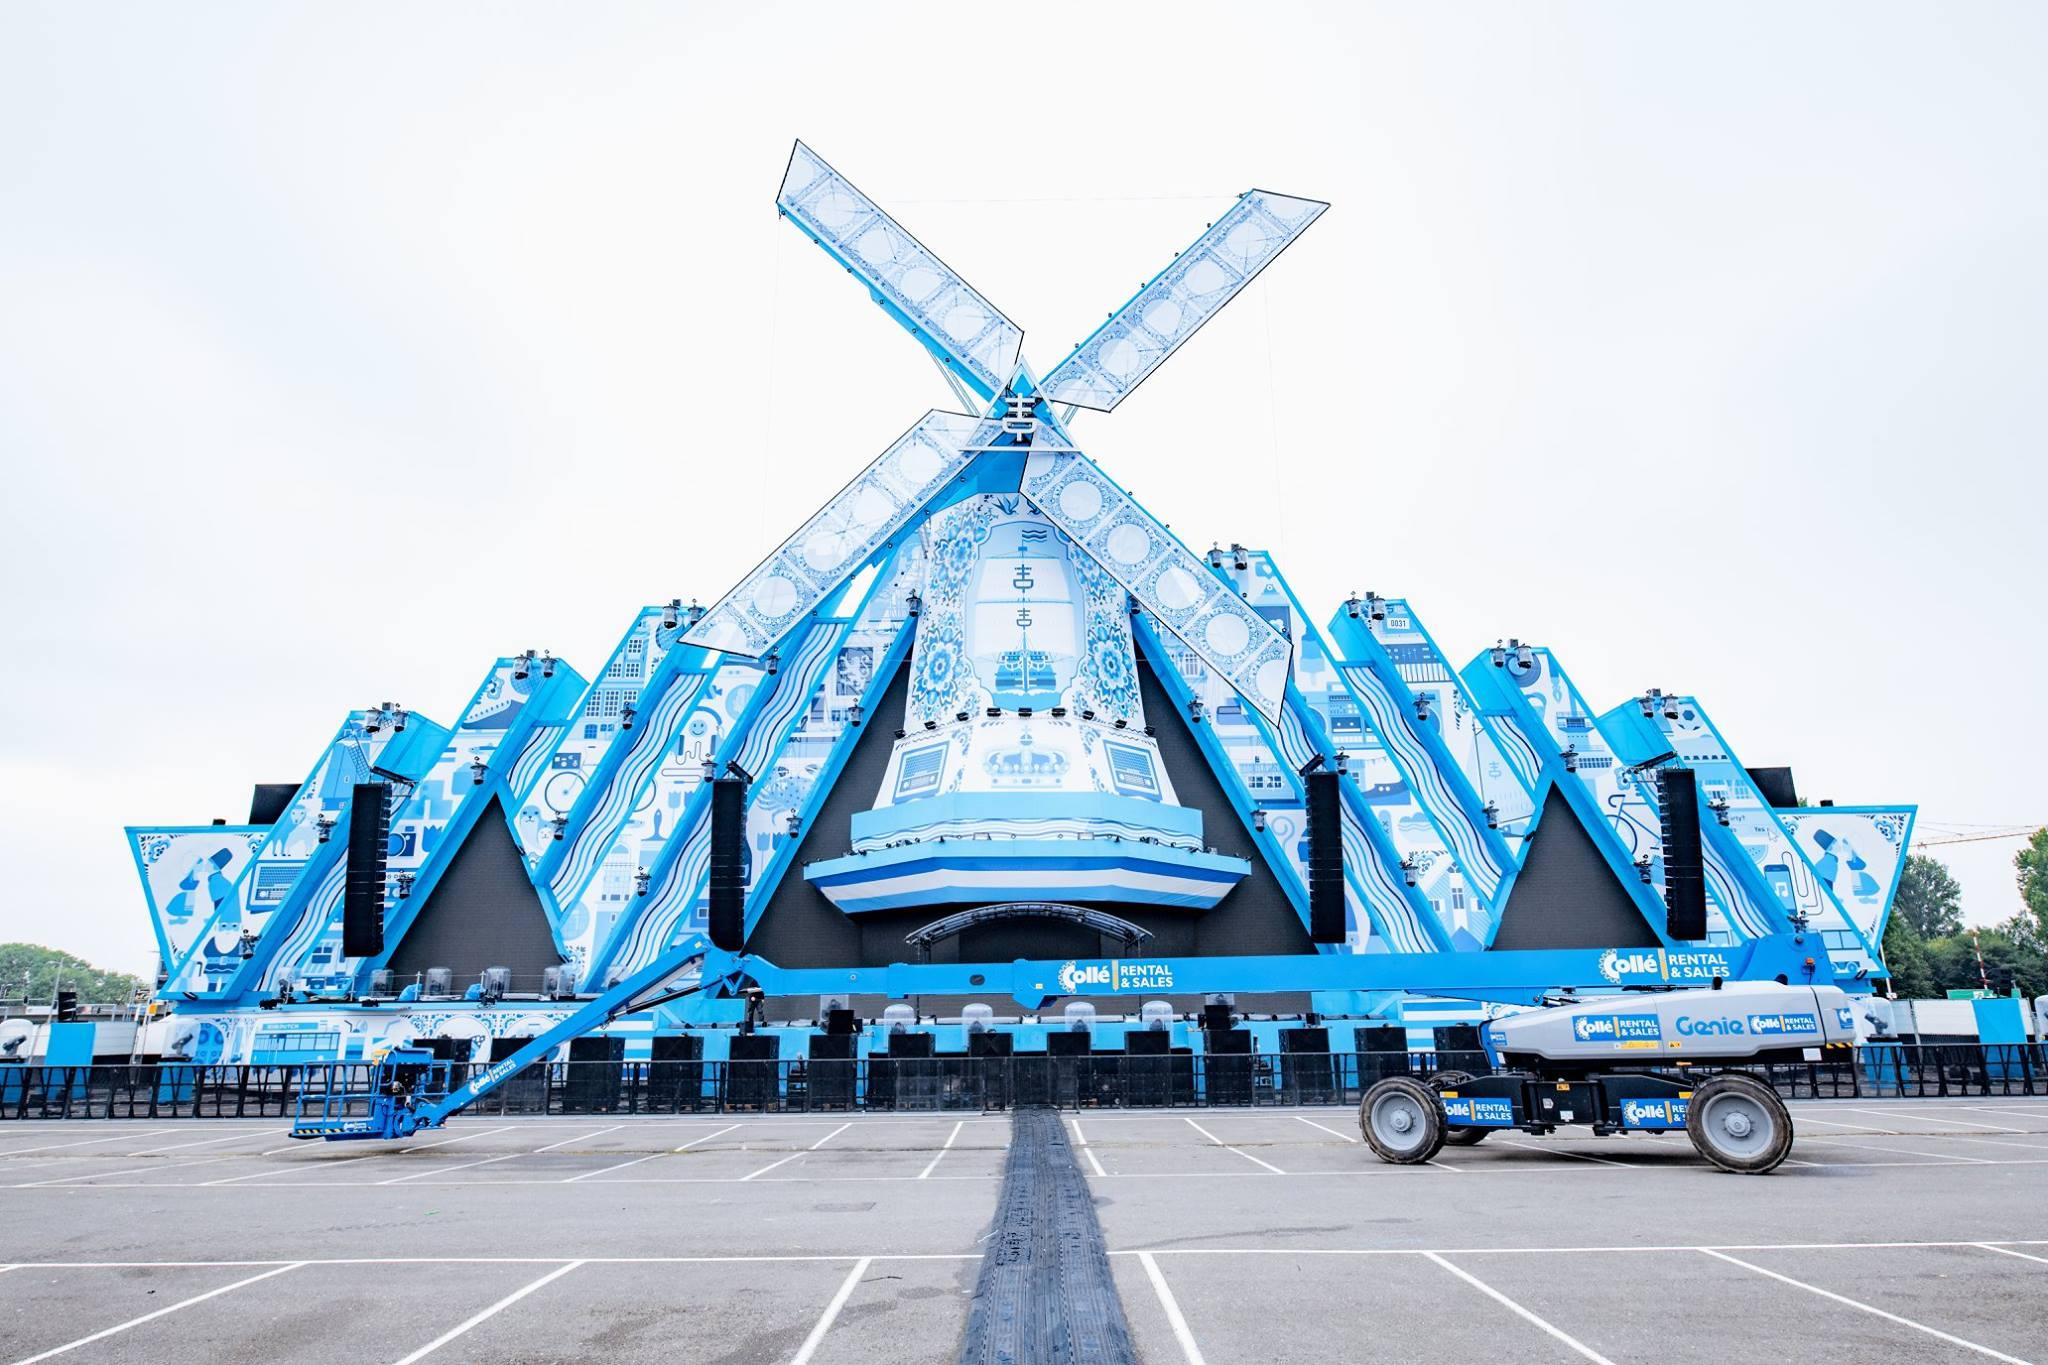 The Flying Dutch 2018